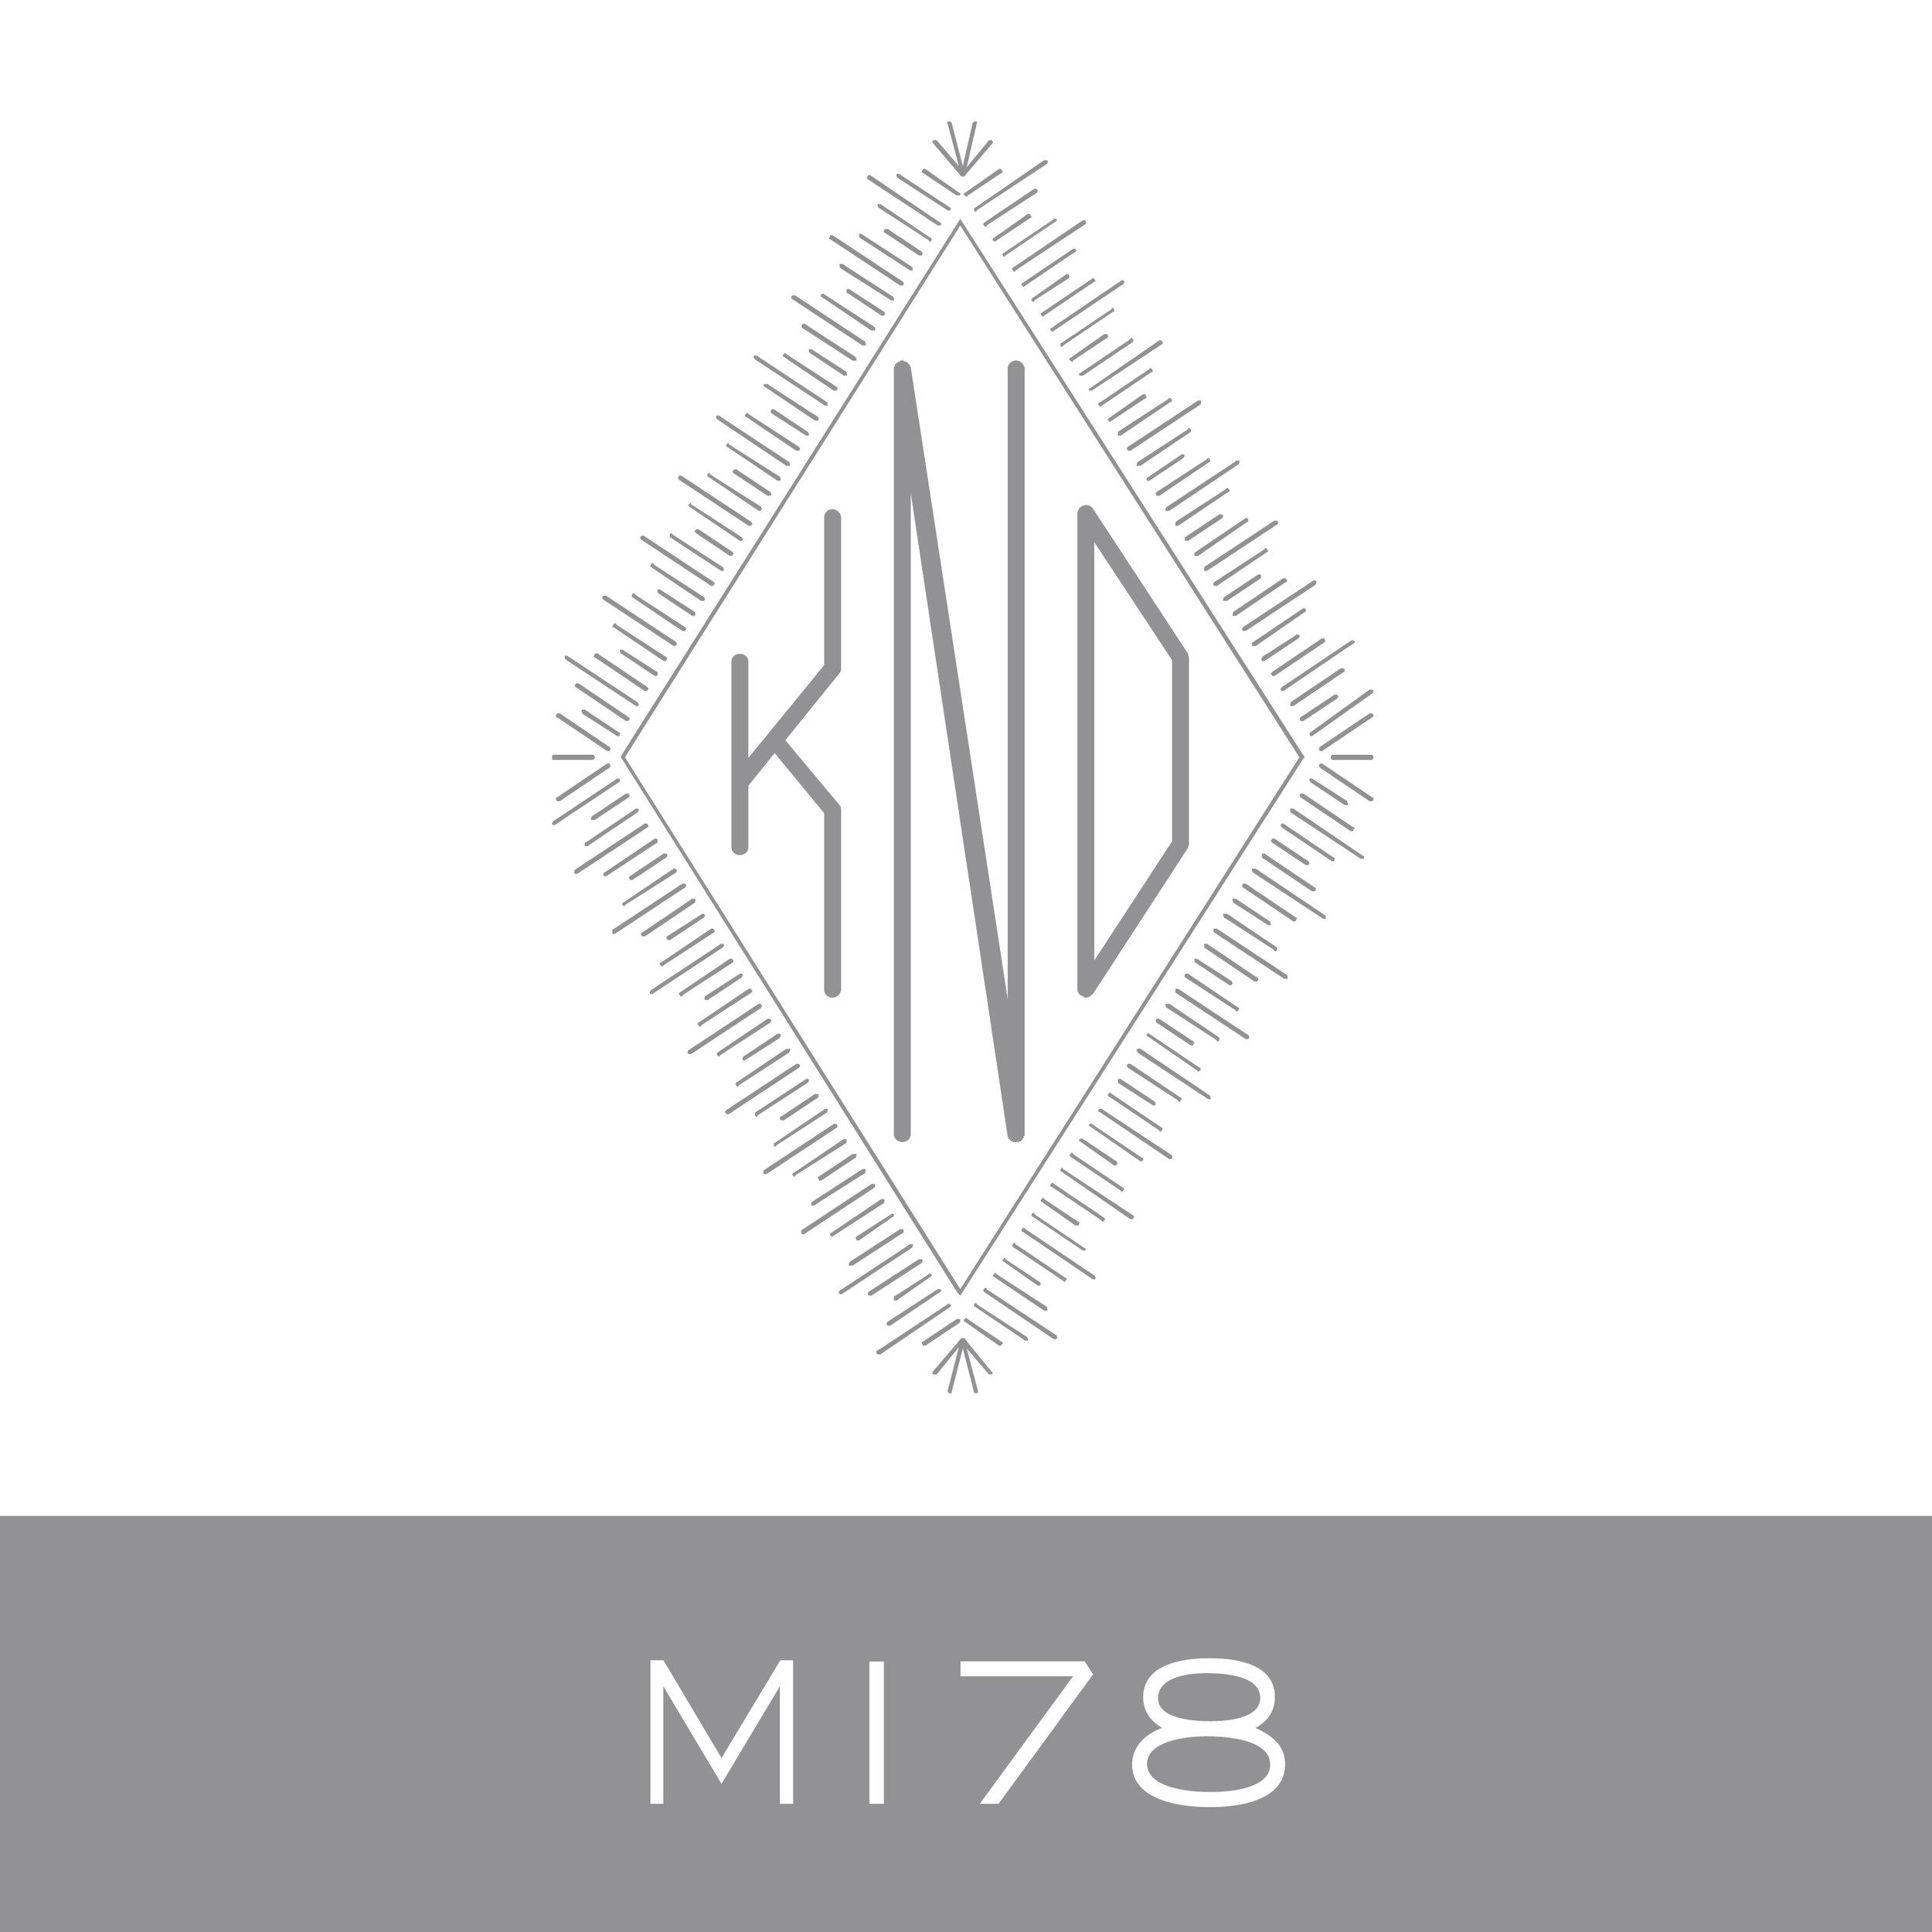 M178.jpg